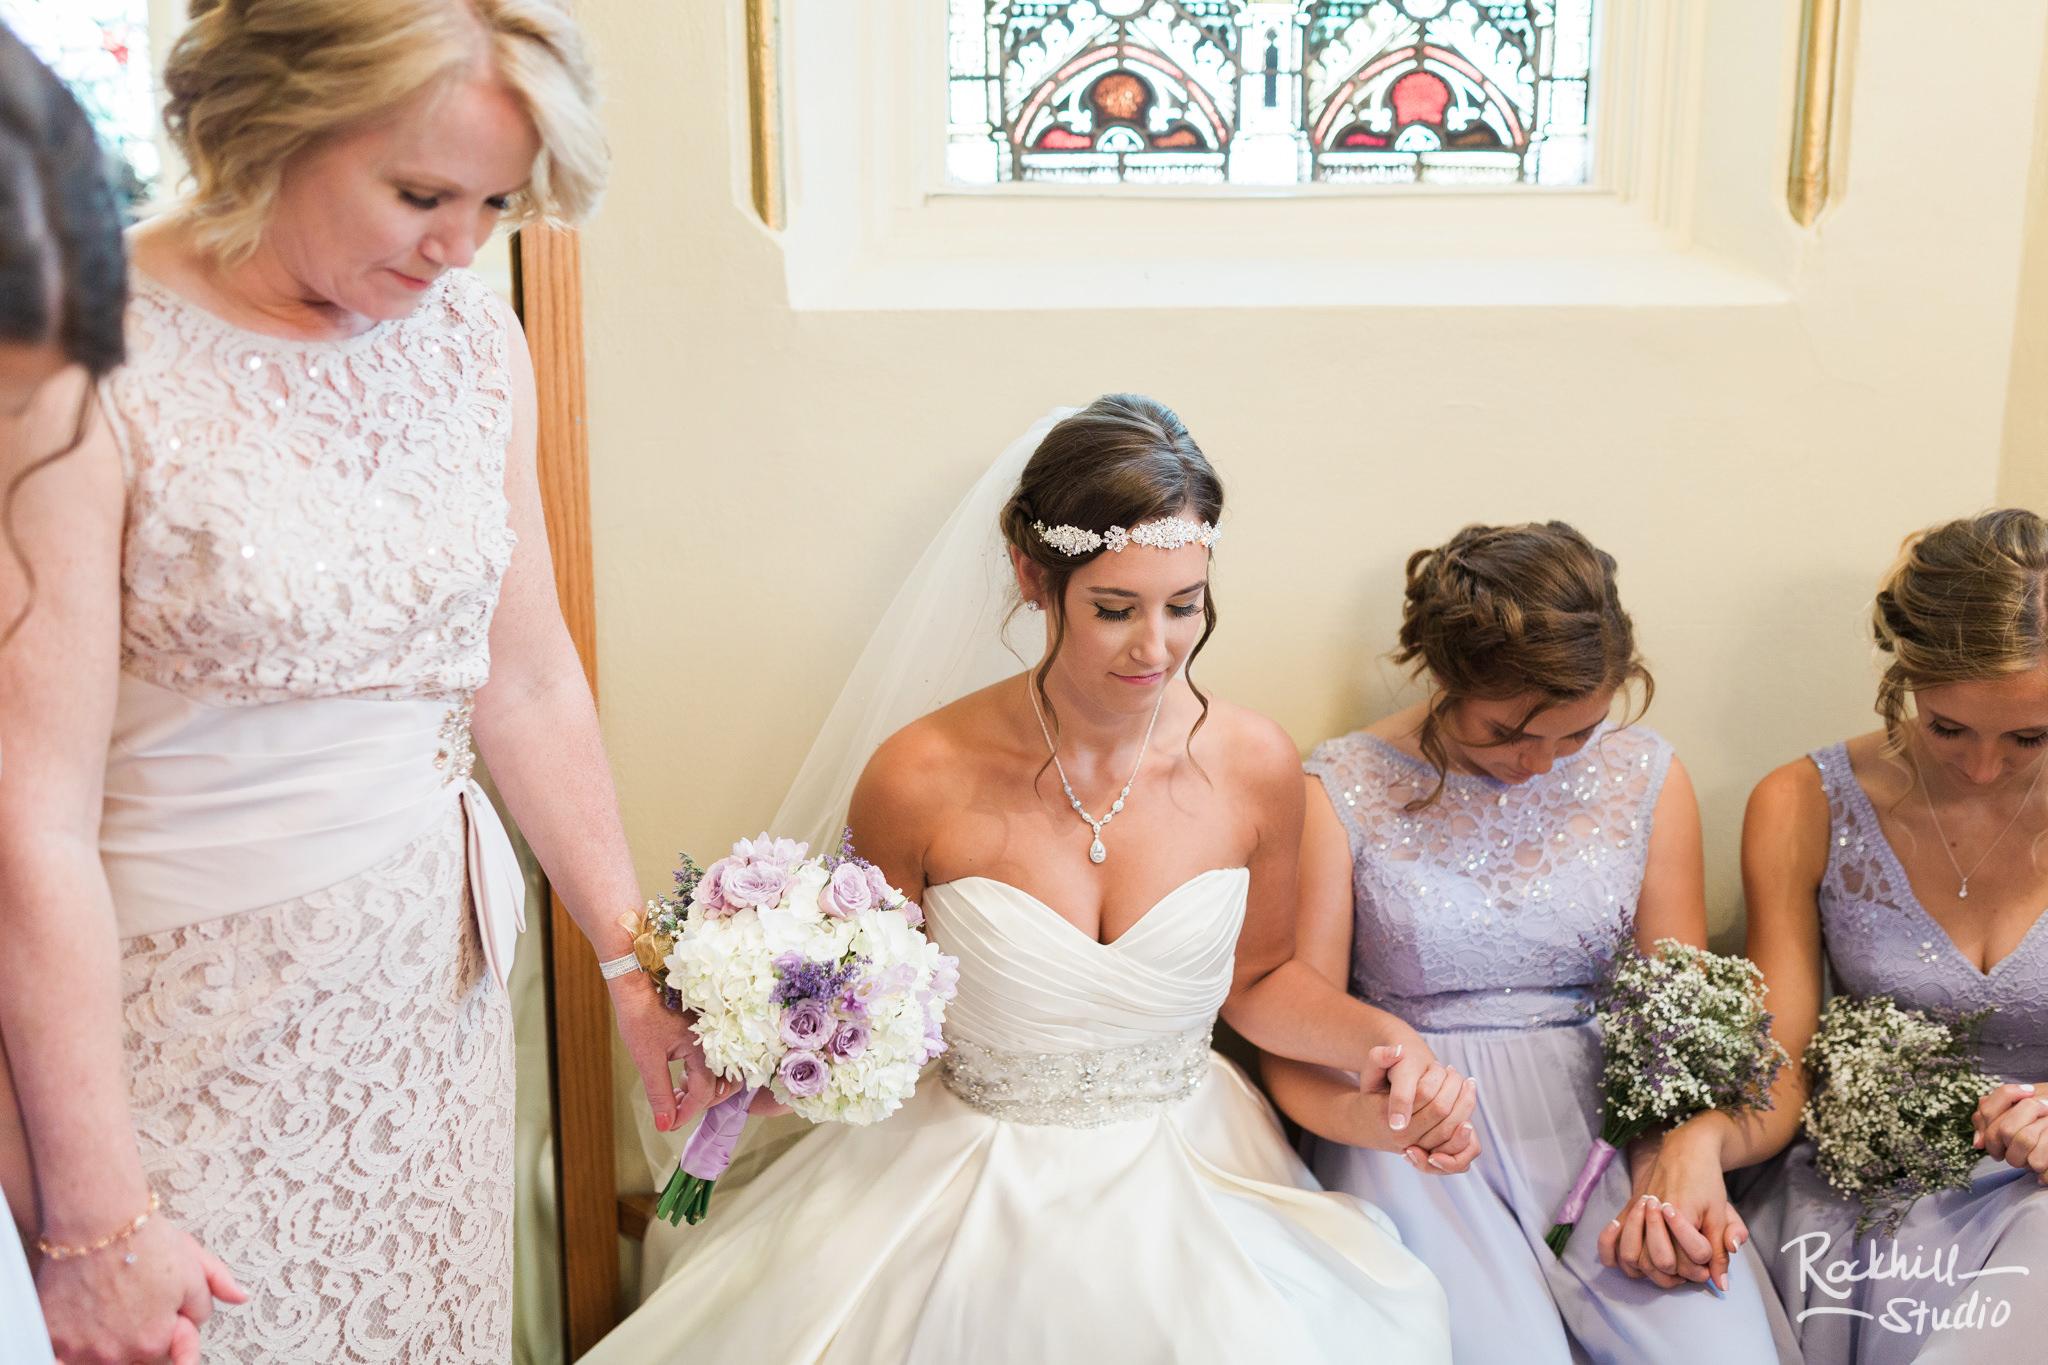 Grand rapids church wedding, traverse city wedding photographer Rockhill Studio